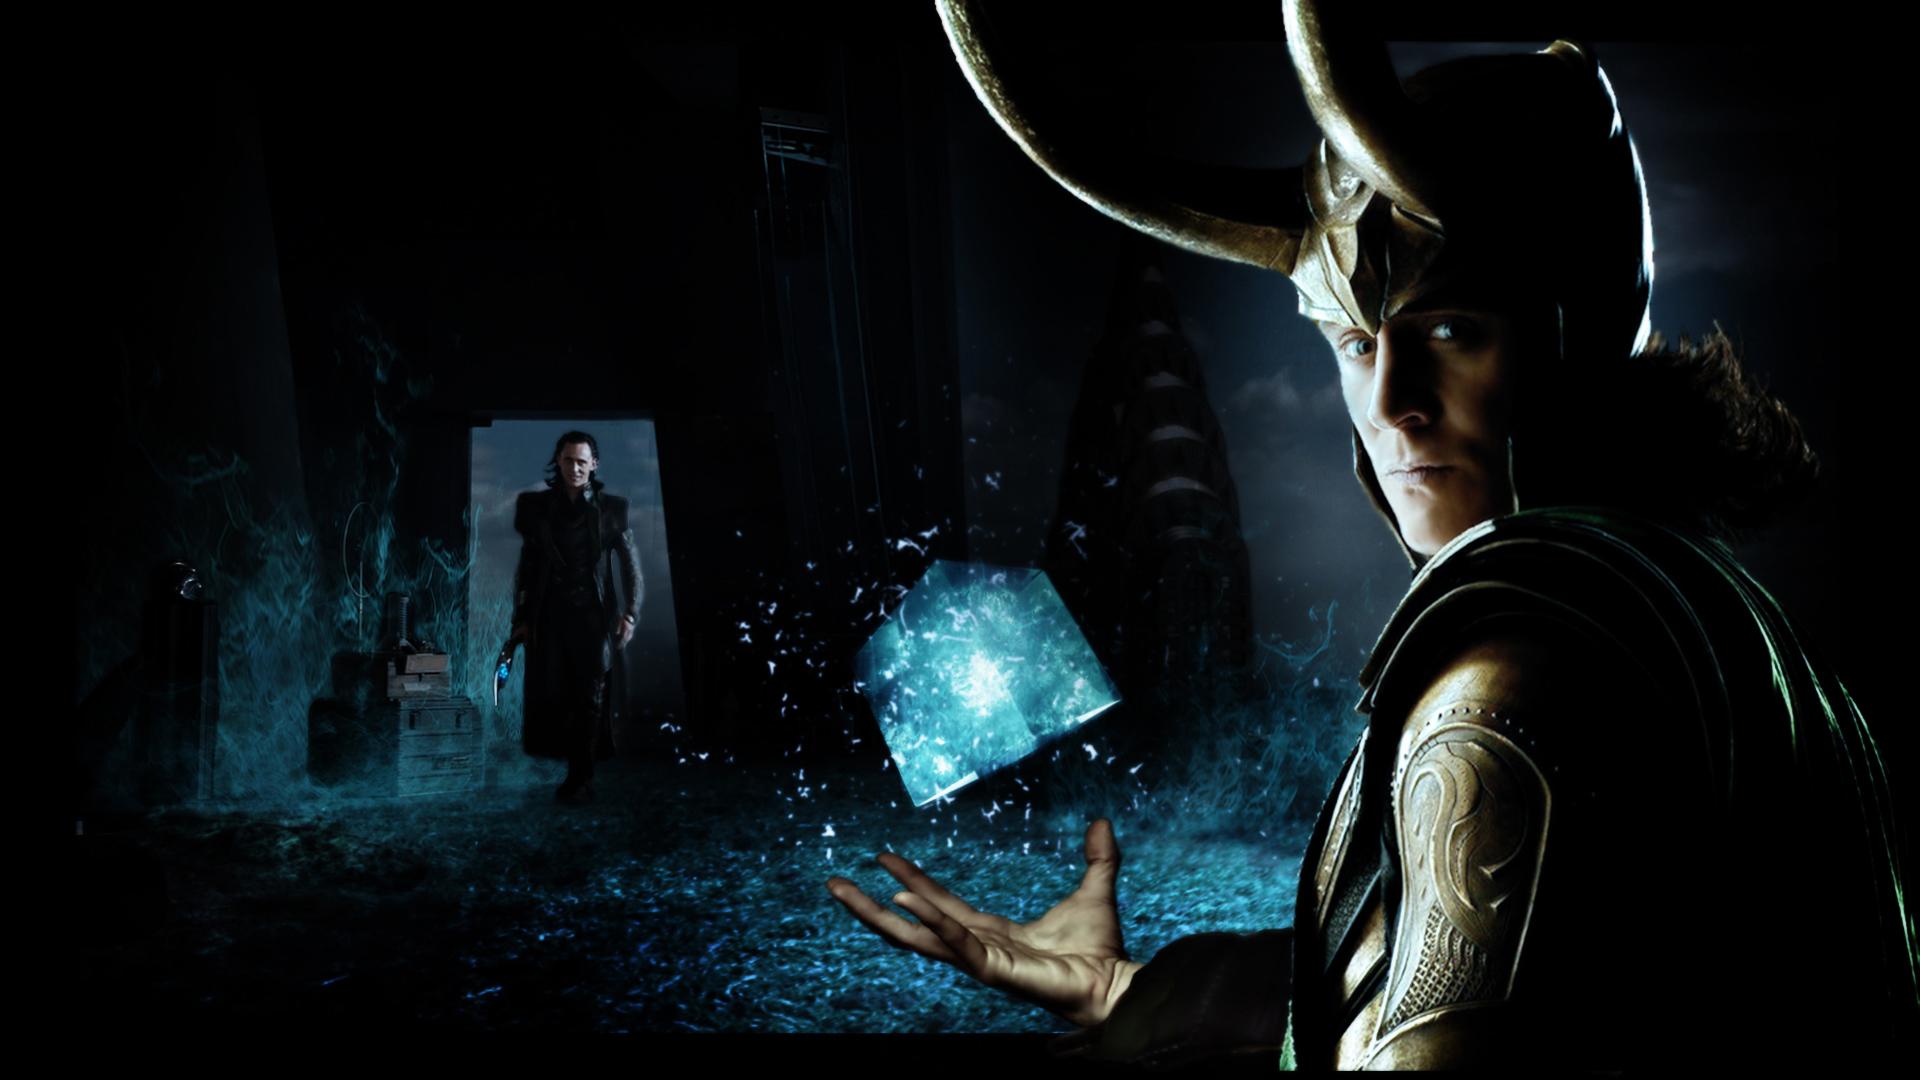 Loki Hd Wallpaper Loki tesseractv2 by stak1073 1920x1080